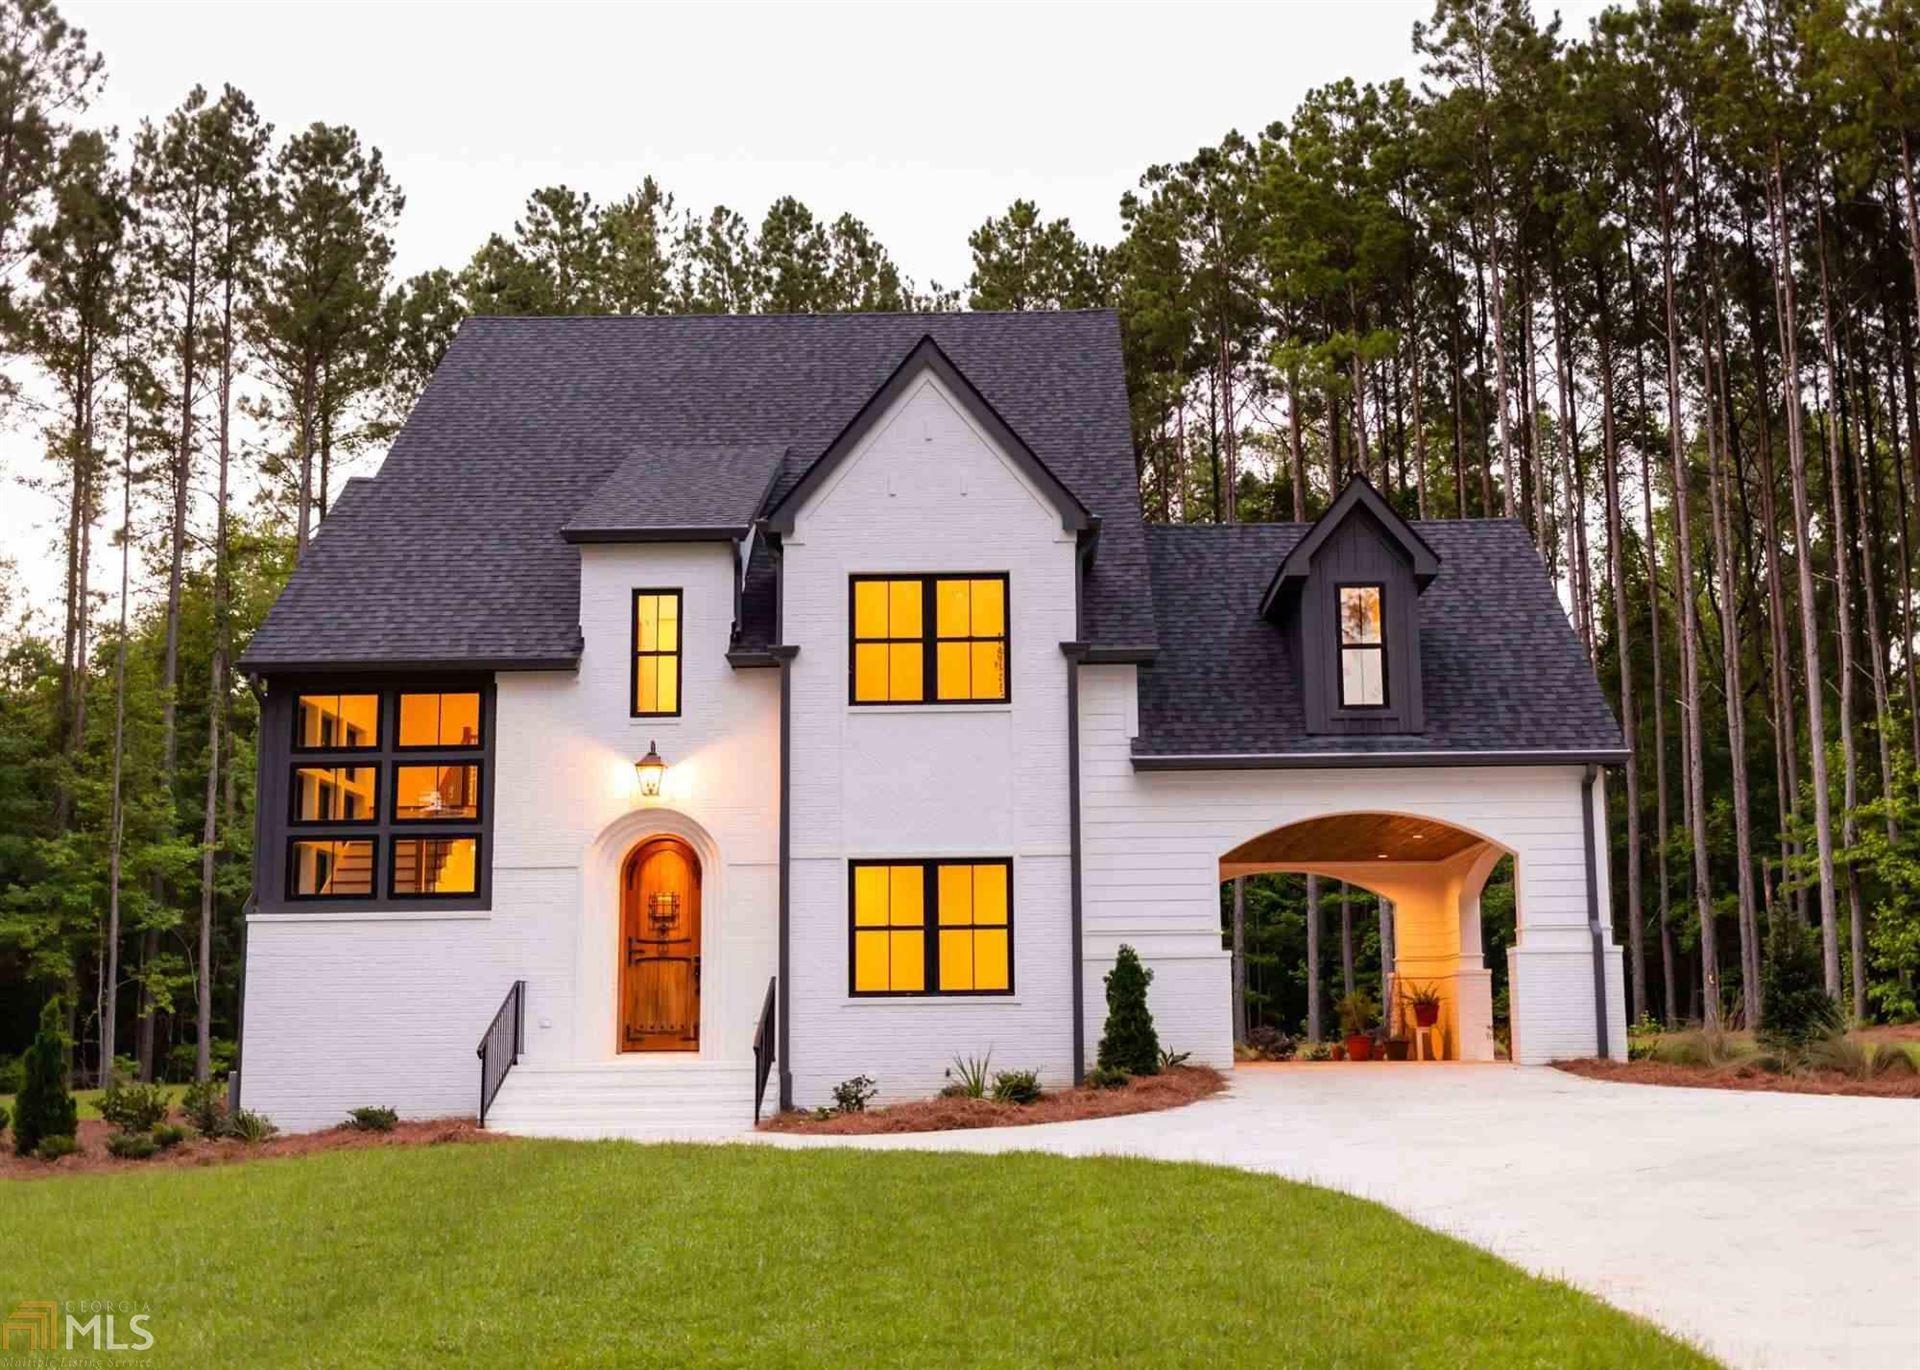 2115 Cypress Hollow Ct, Statesboro, GA 30458 - #: 8815483